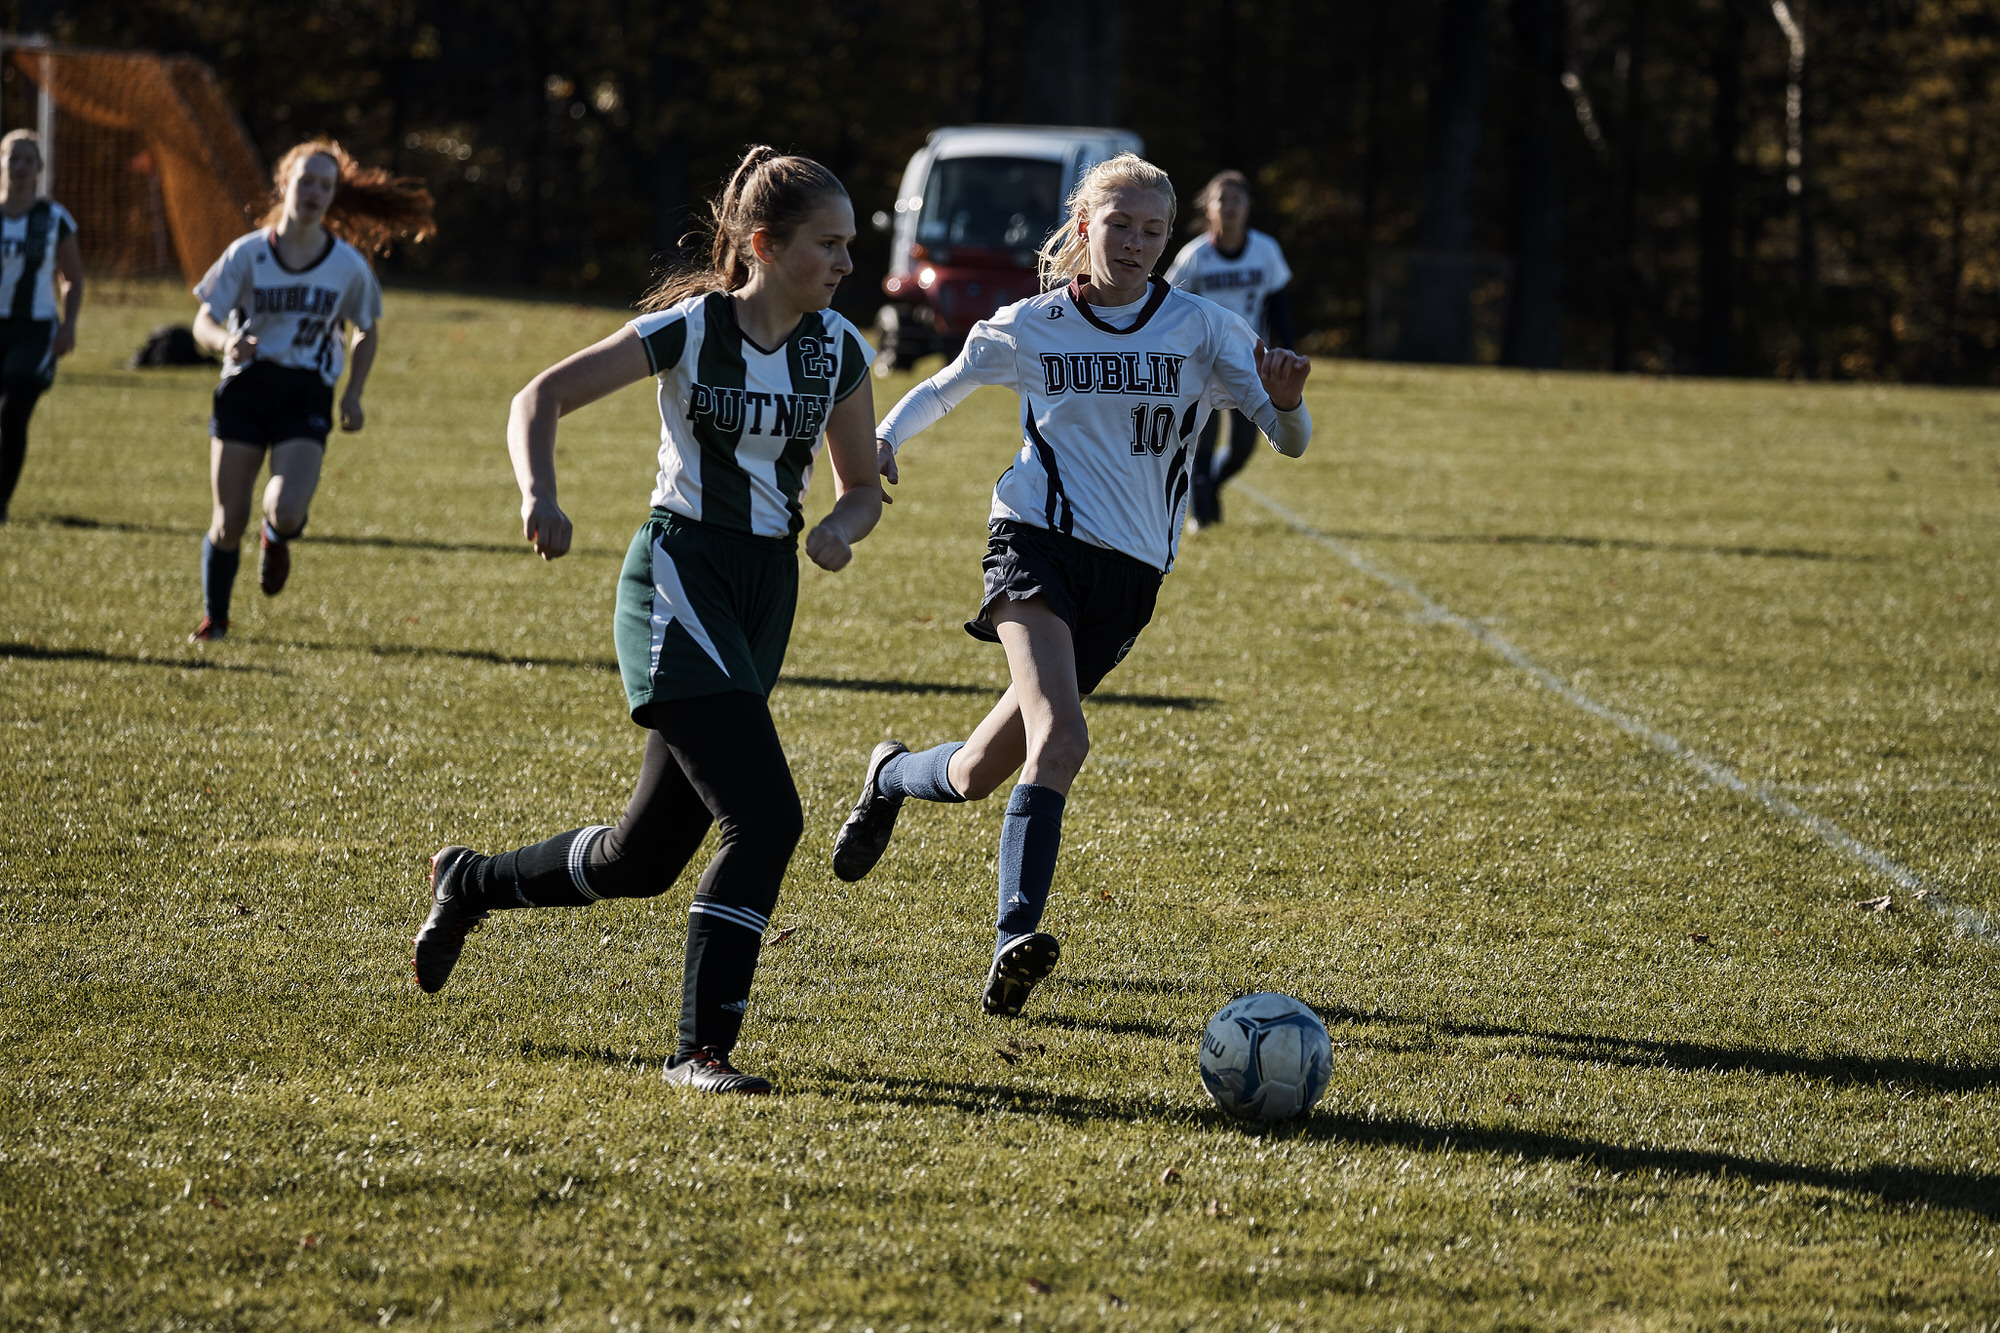 Girls Varsity Soccer vs. Putney School - October 26, 2018 - 012.jpg